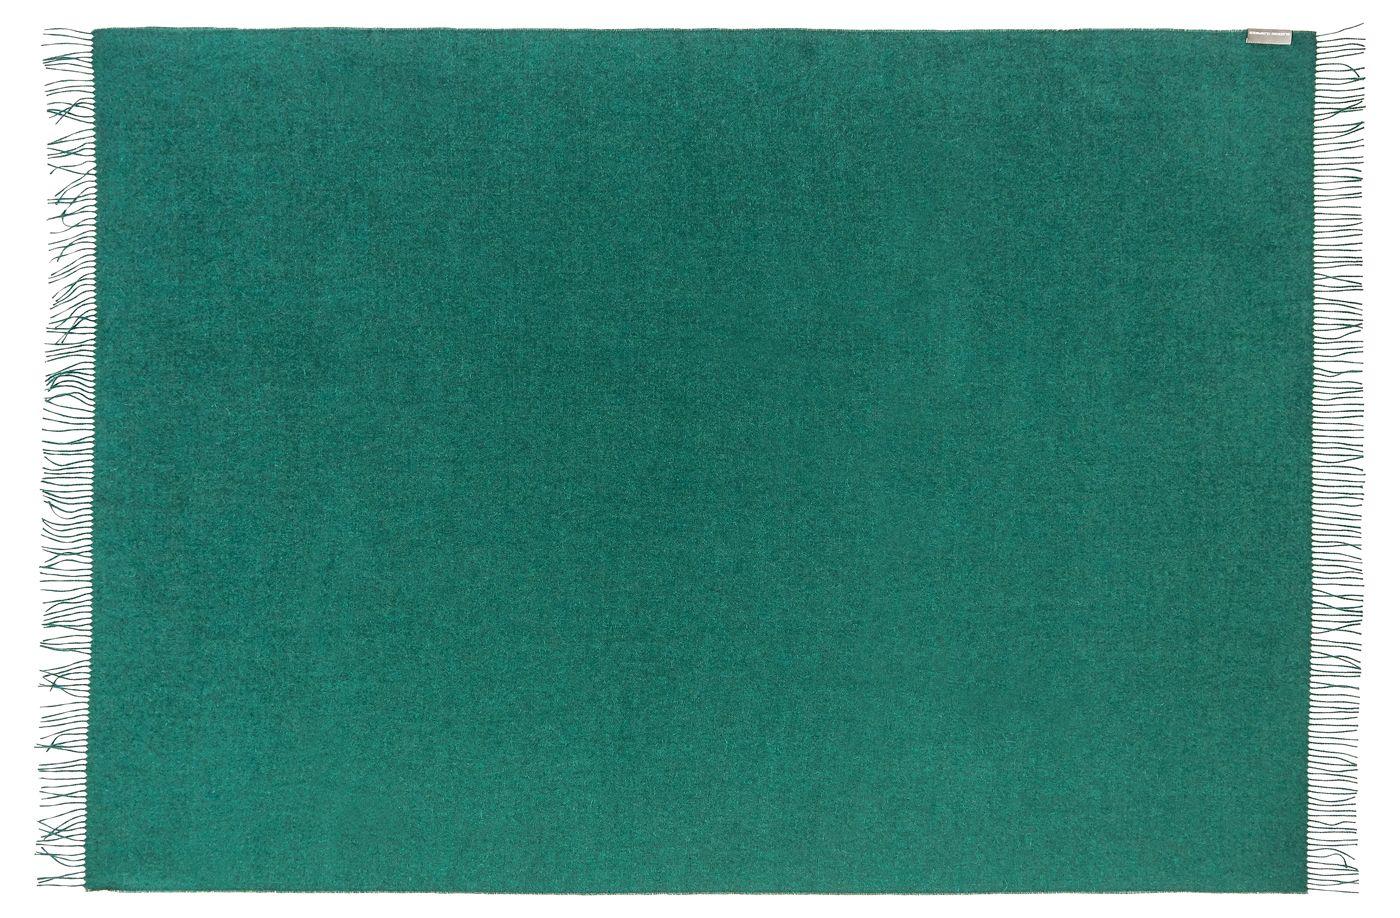 Lima Plaid, Grøn Baby Alpaca, 200x130 - Silkeborg Uldspinderi